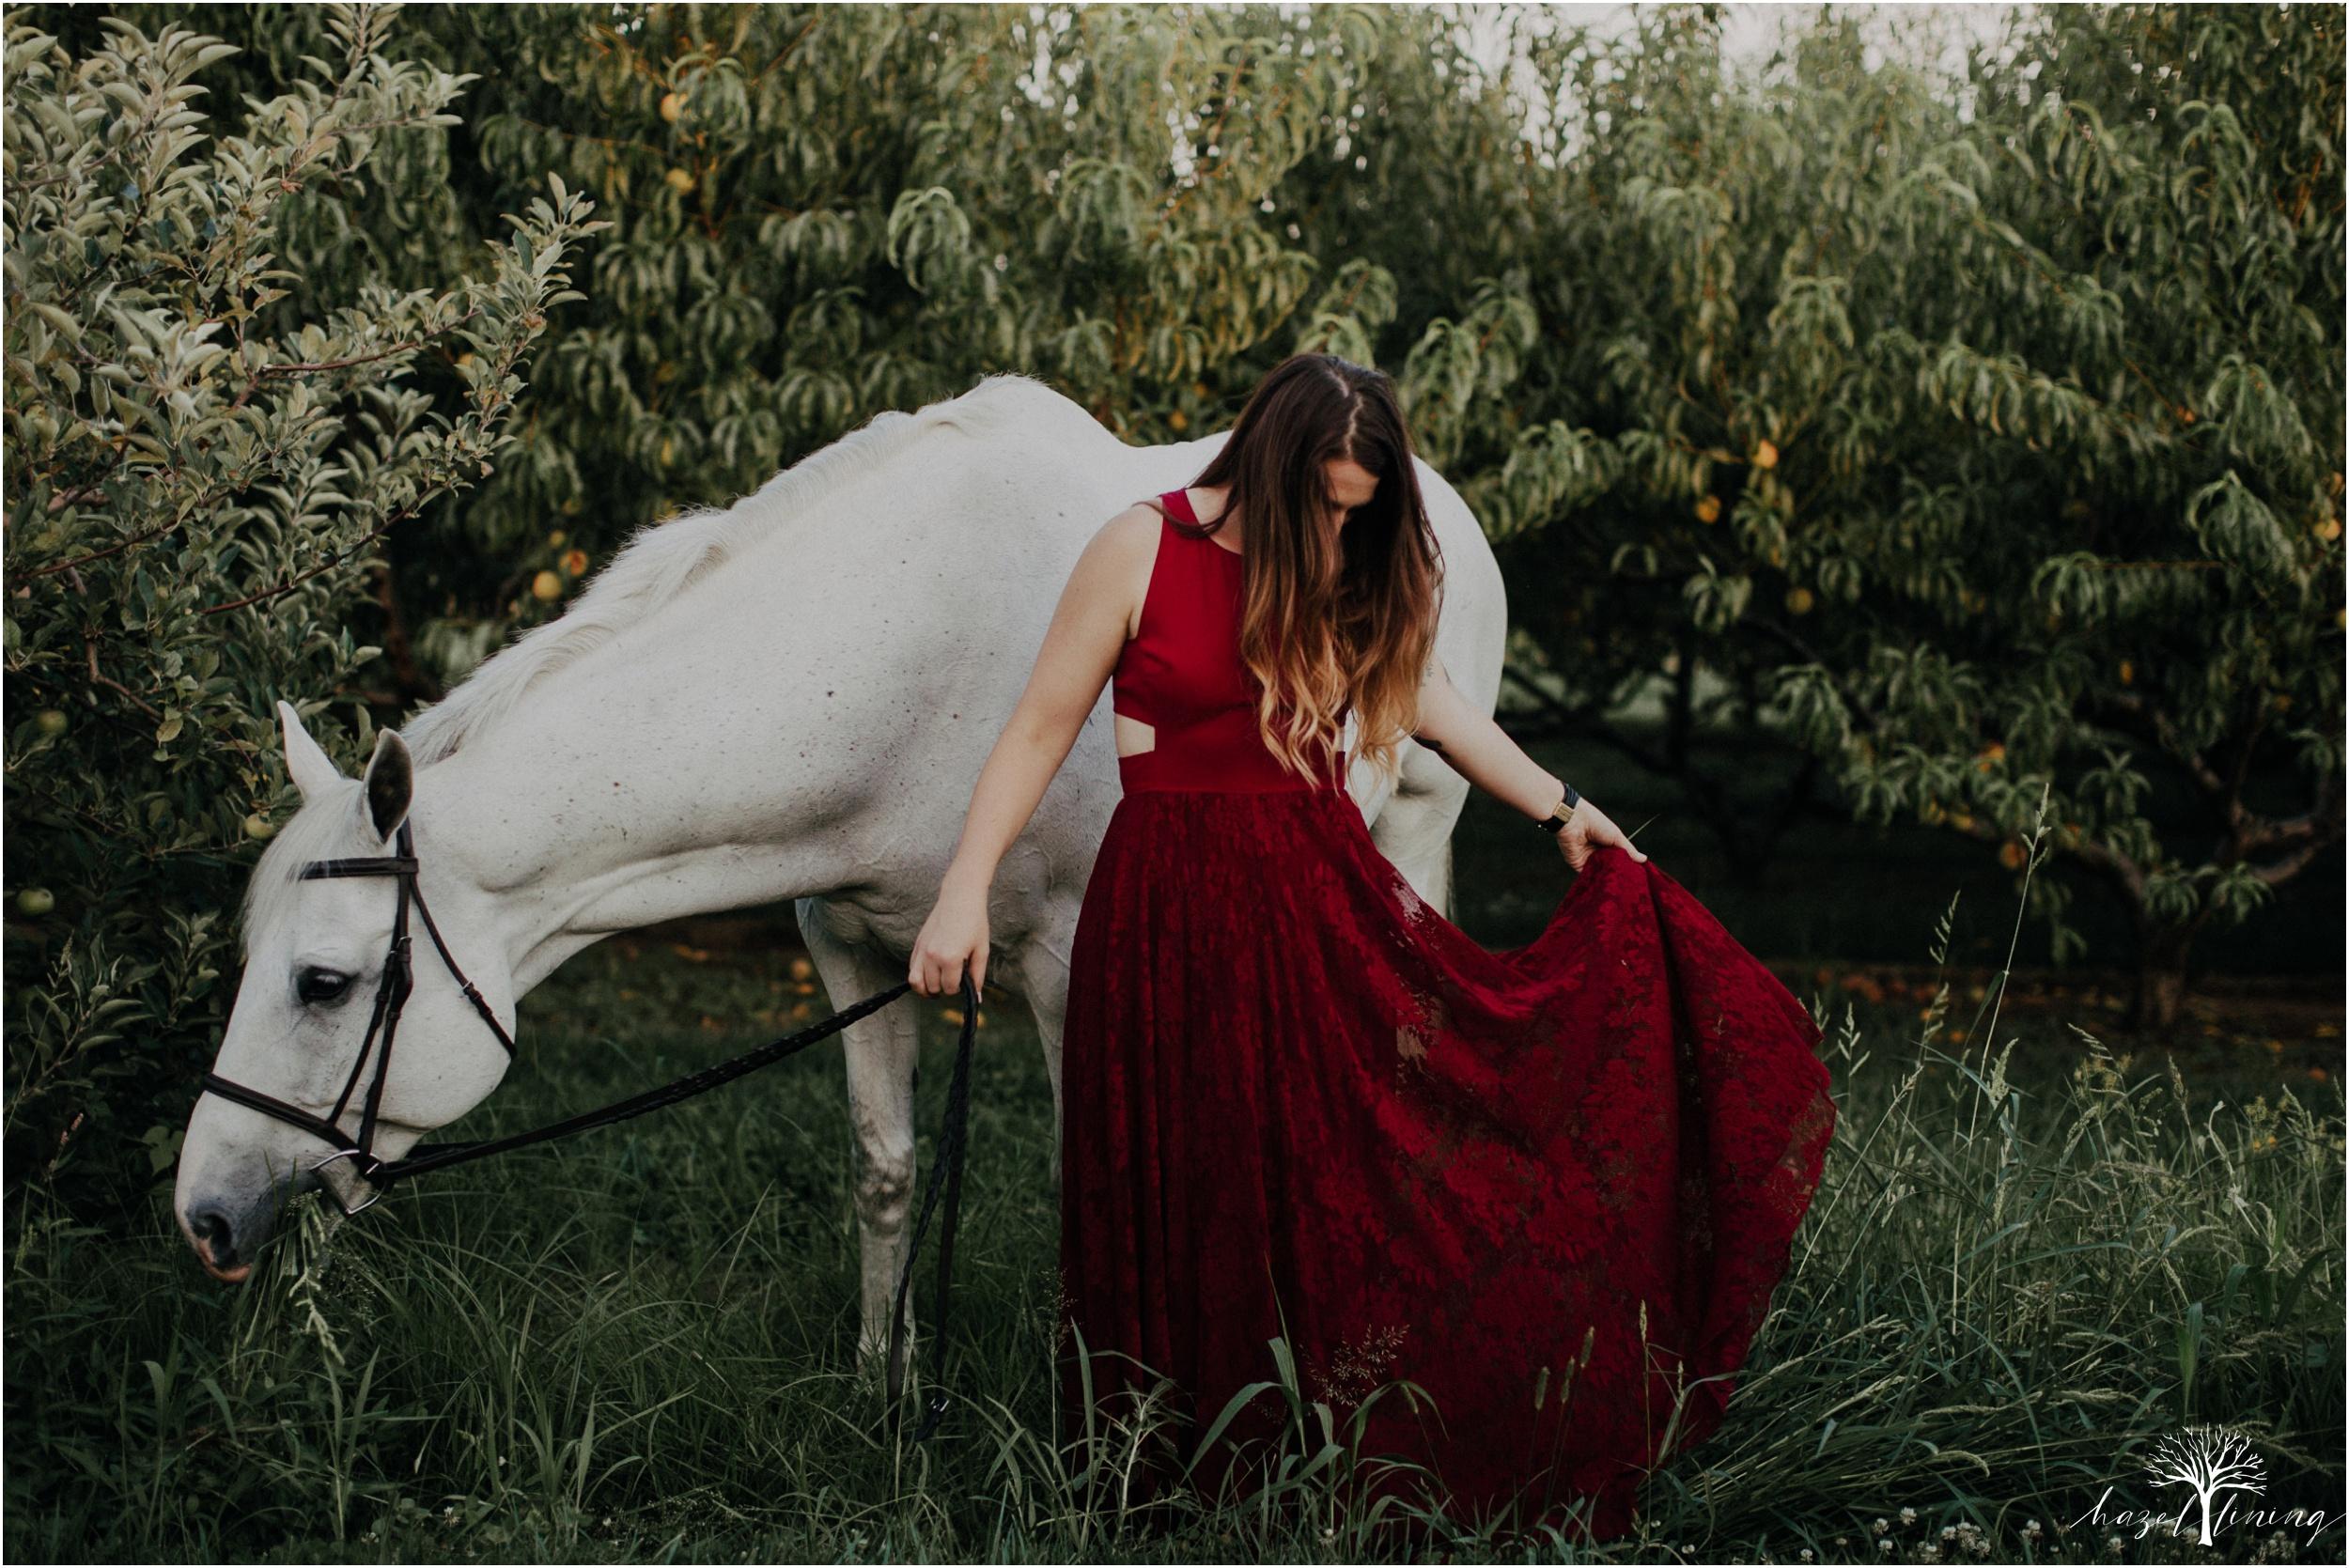 taylor-adams-and-horse-delaware-valley-university-delval-summer-equestrian-portrait-session-hazel-lining-photography-destination-elopement-wedding-engagement-photography_0045.jpg